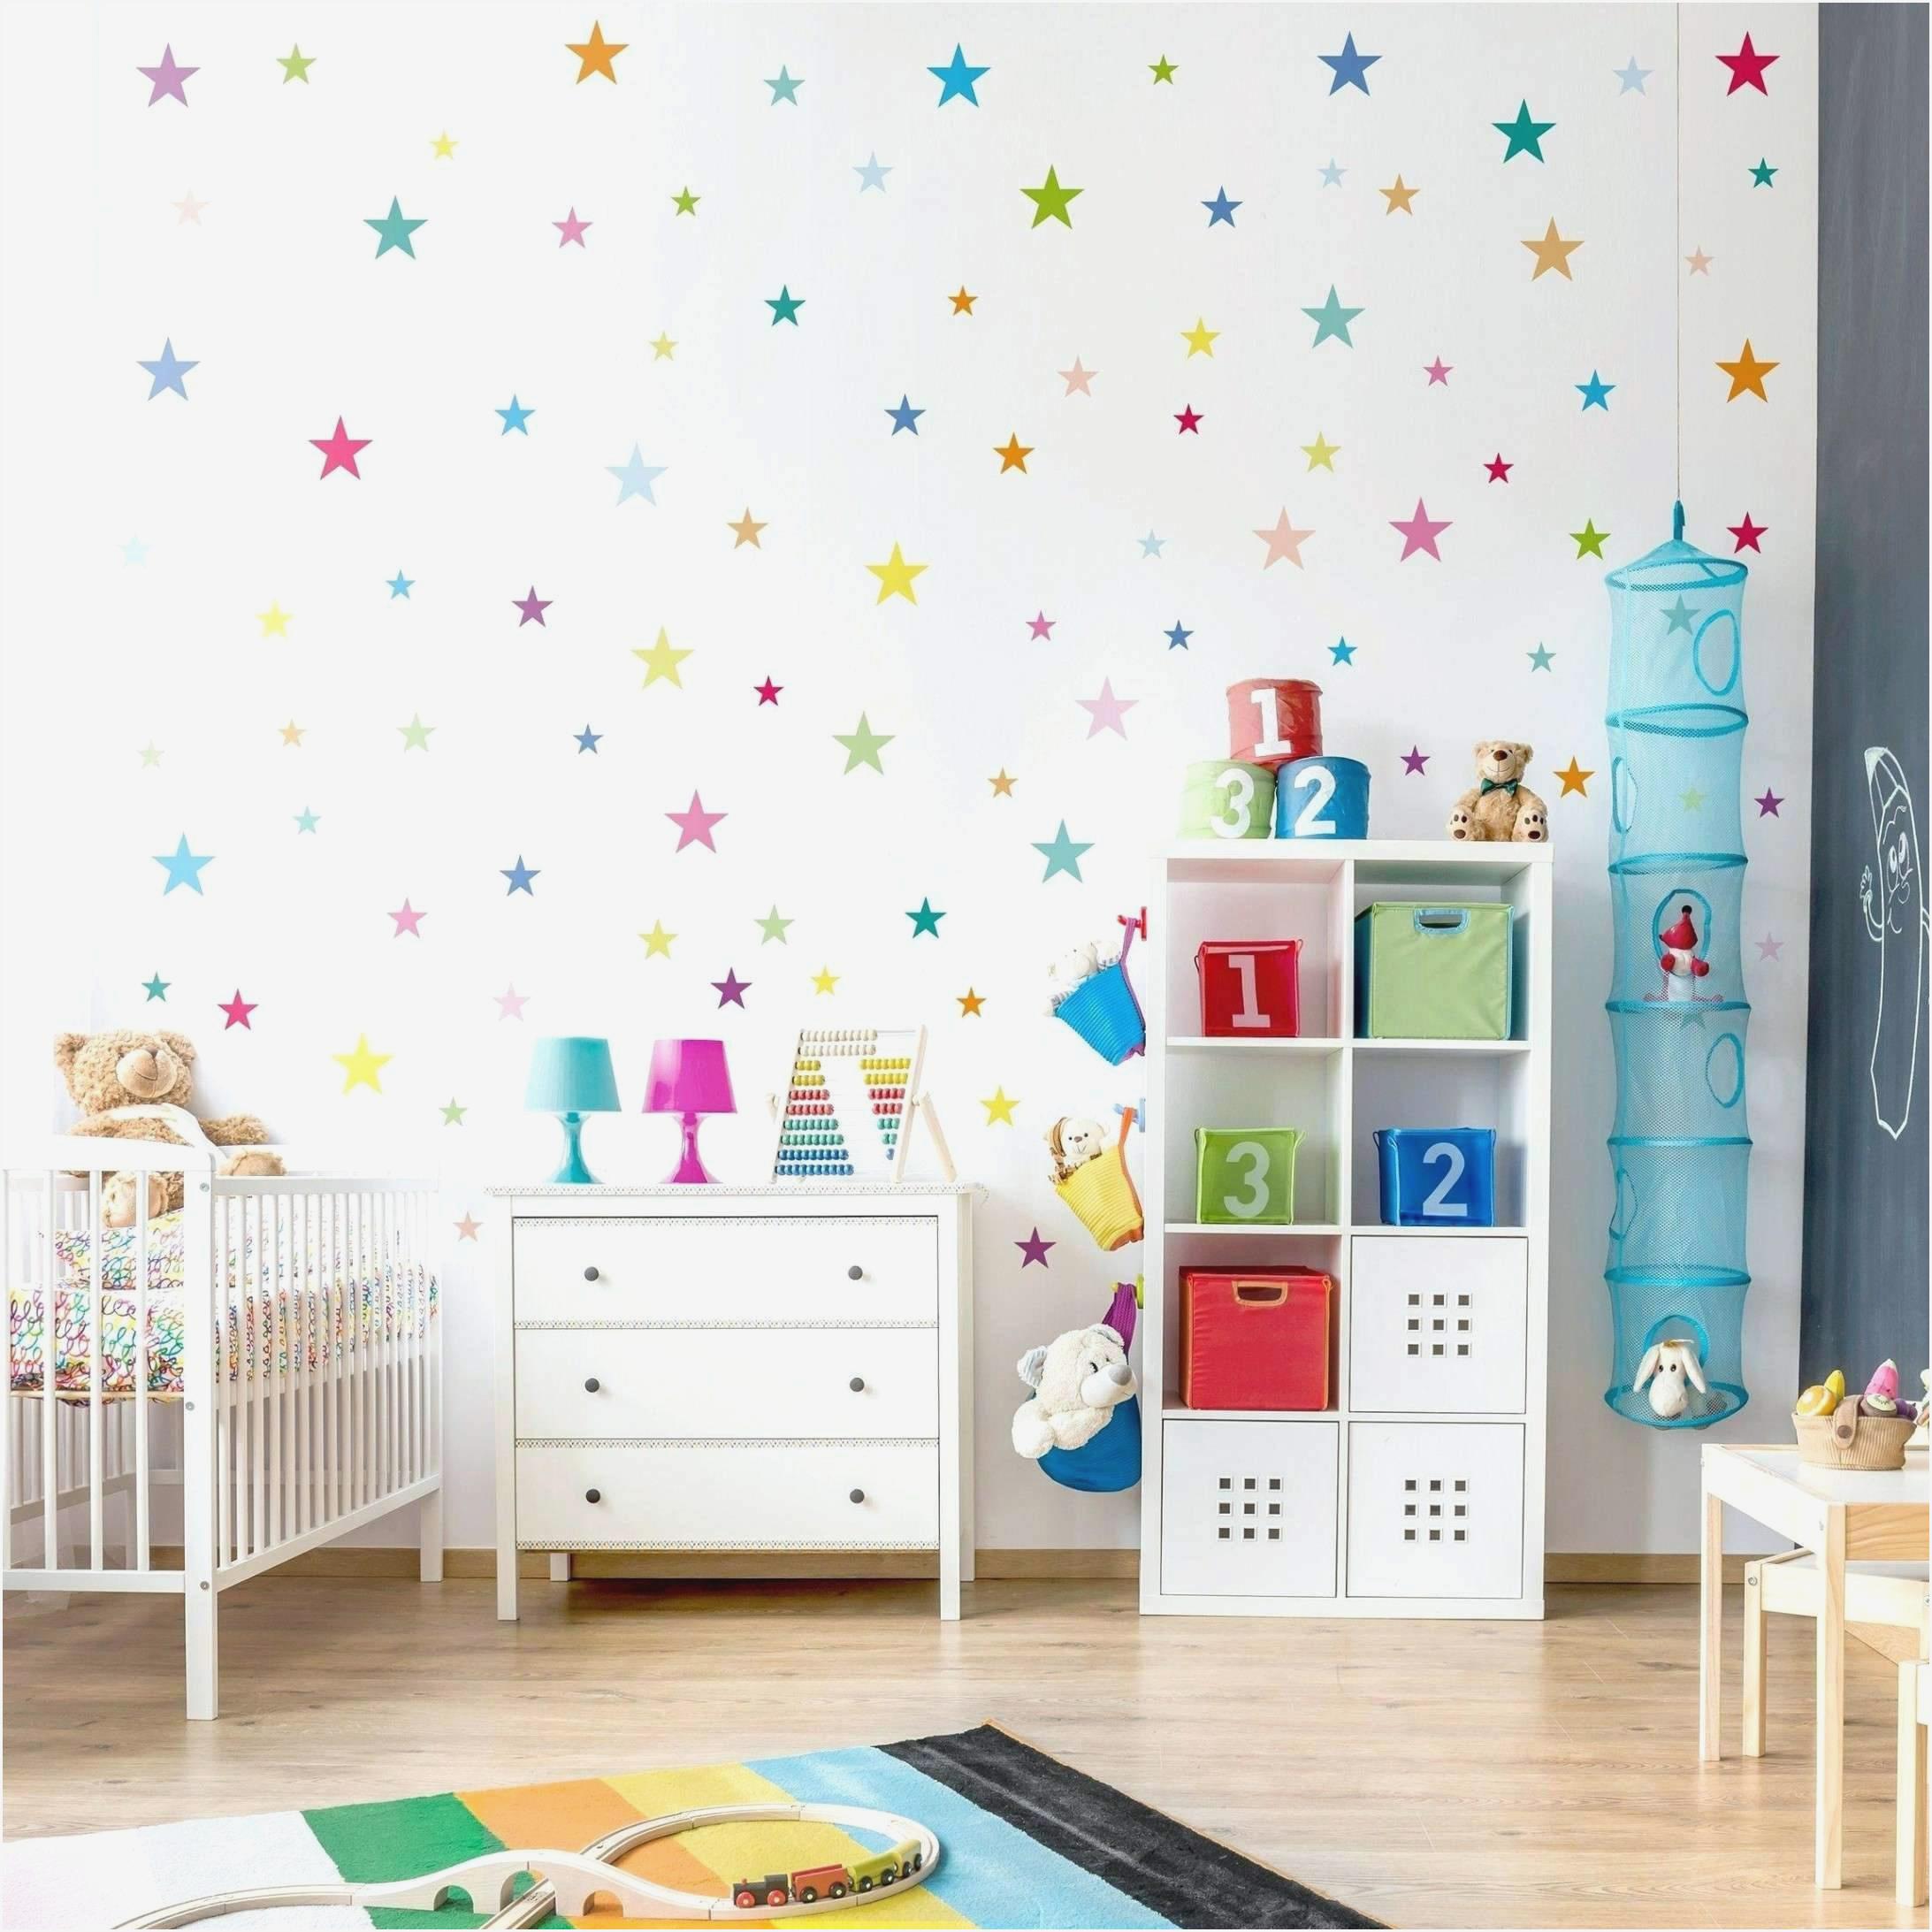 Full Size of Wandschablonen Kinderzimmer Regale Regal Sofa Weiß Kinderzimmer Wandschablonen Kinderzimmer